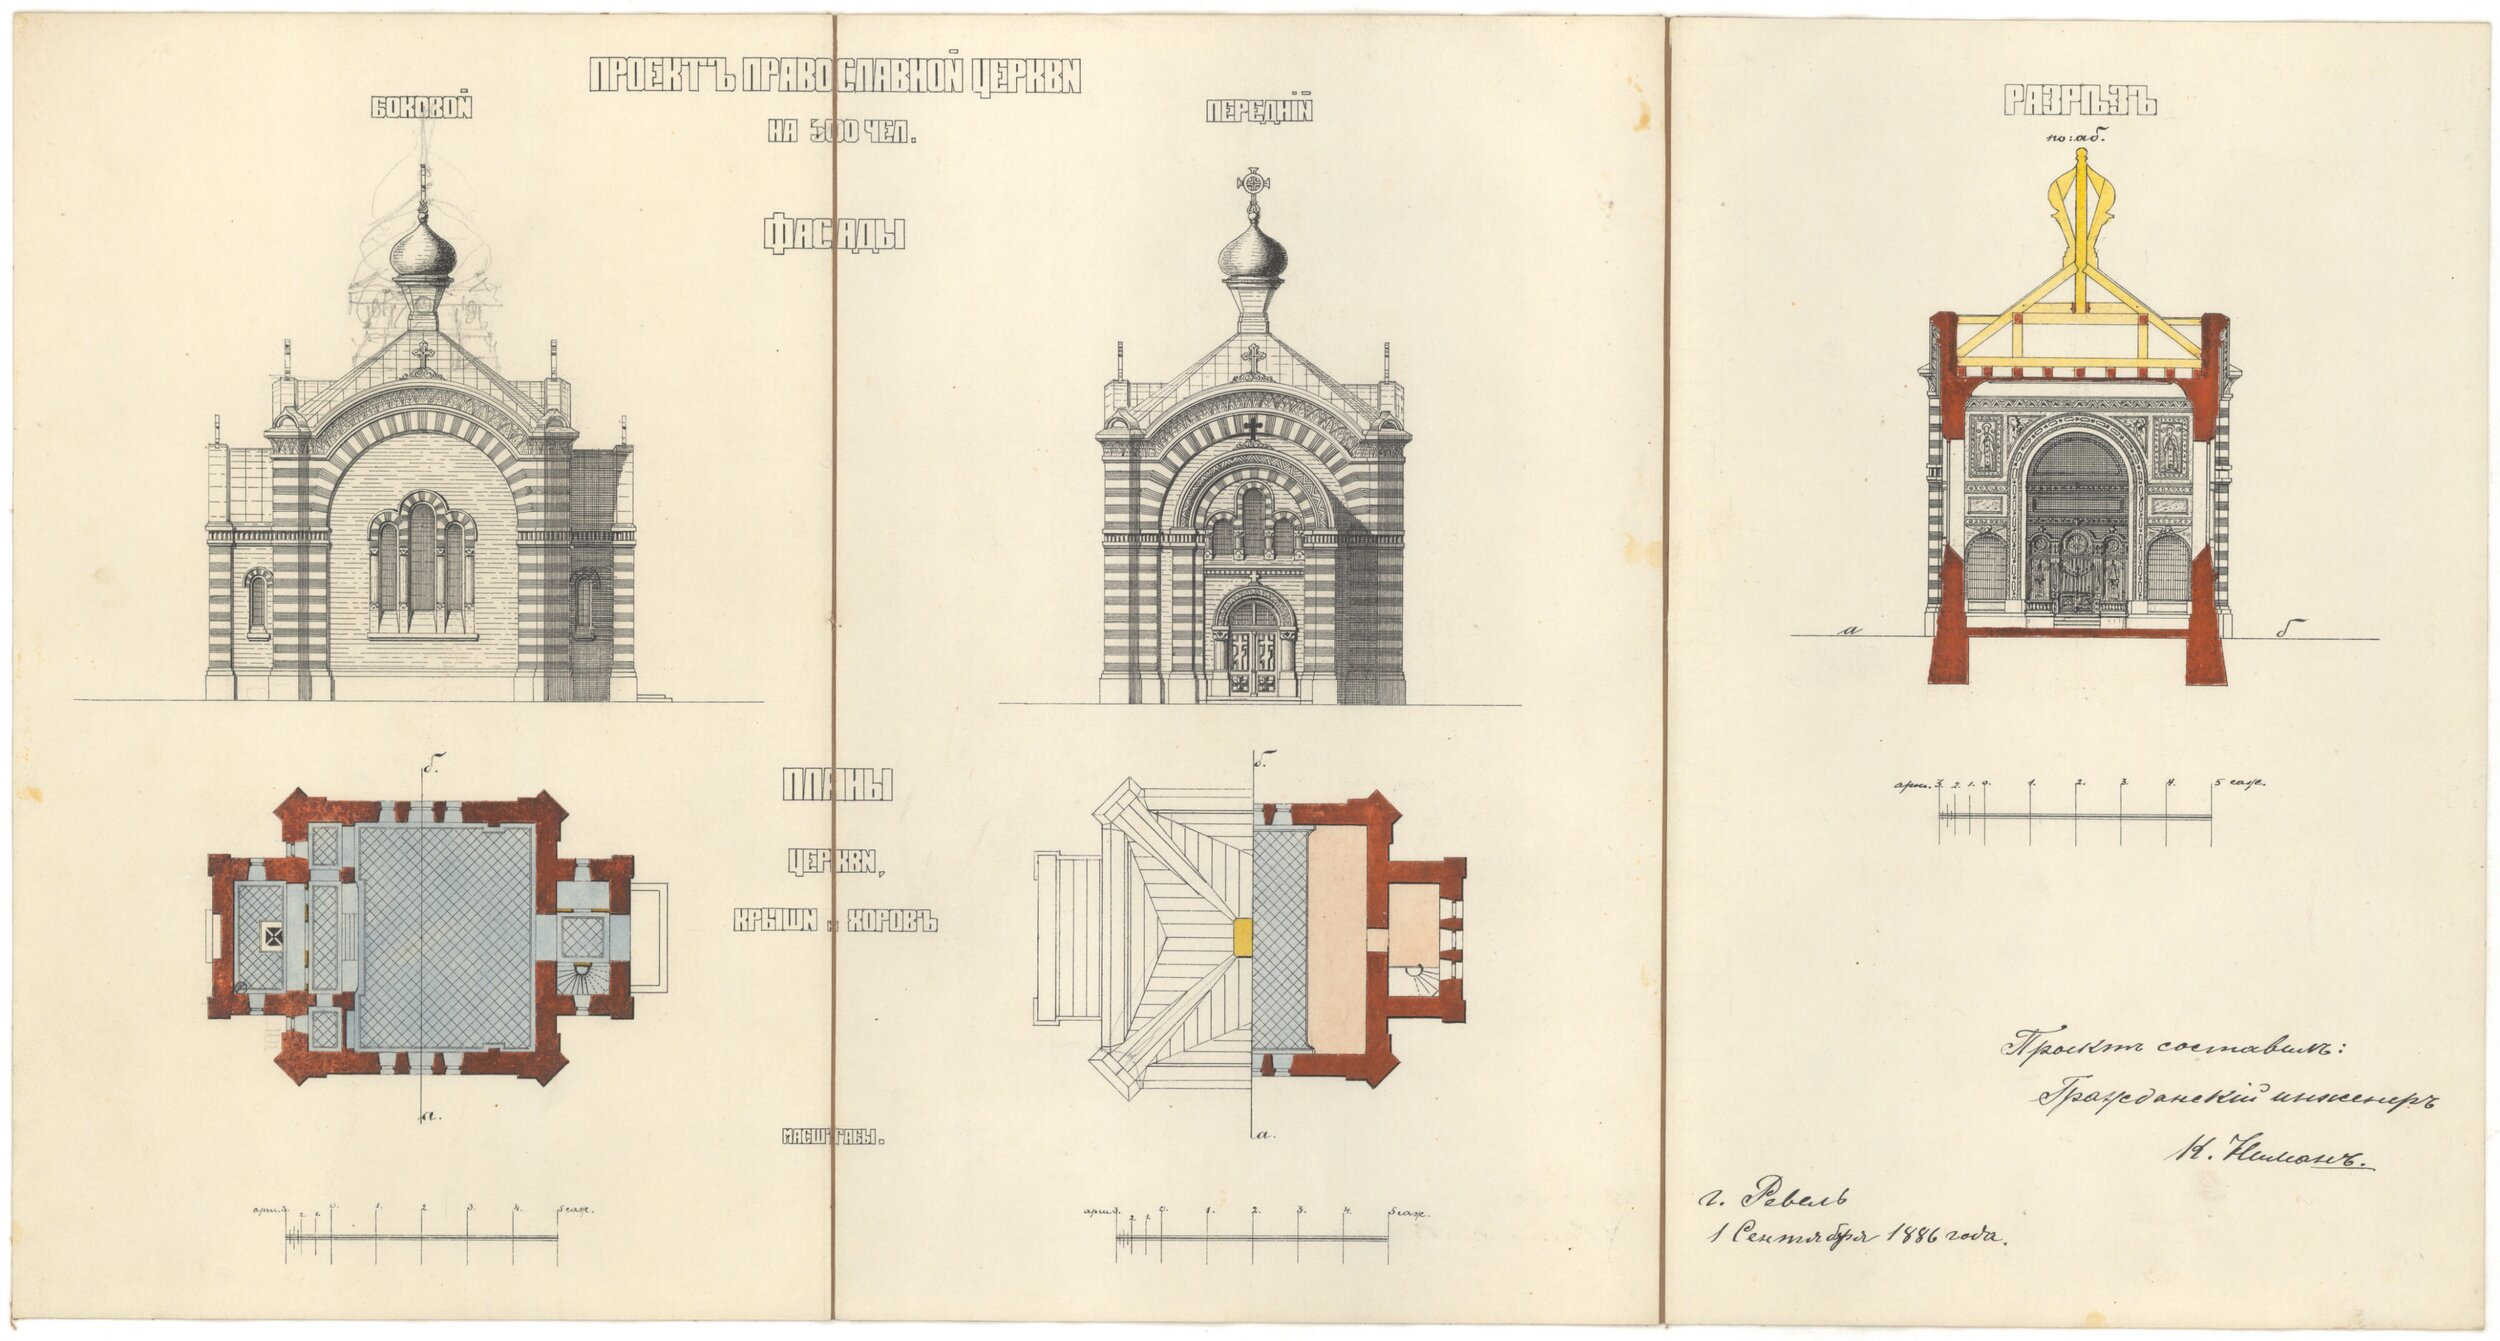 Plans of the Vormsi church